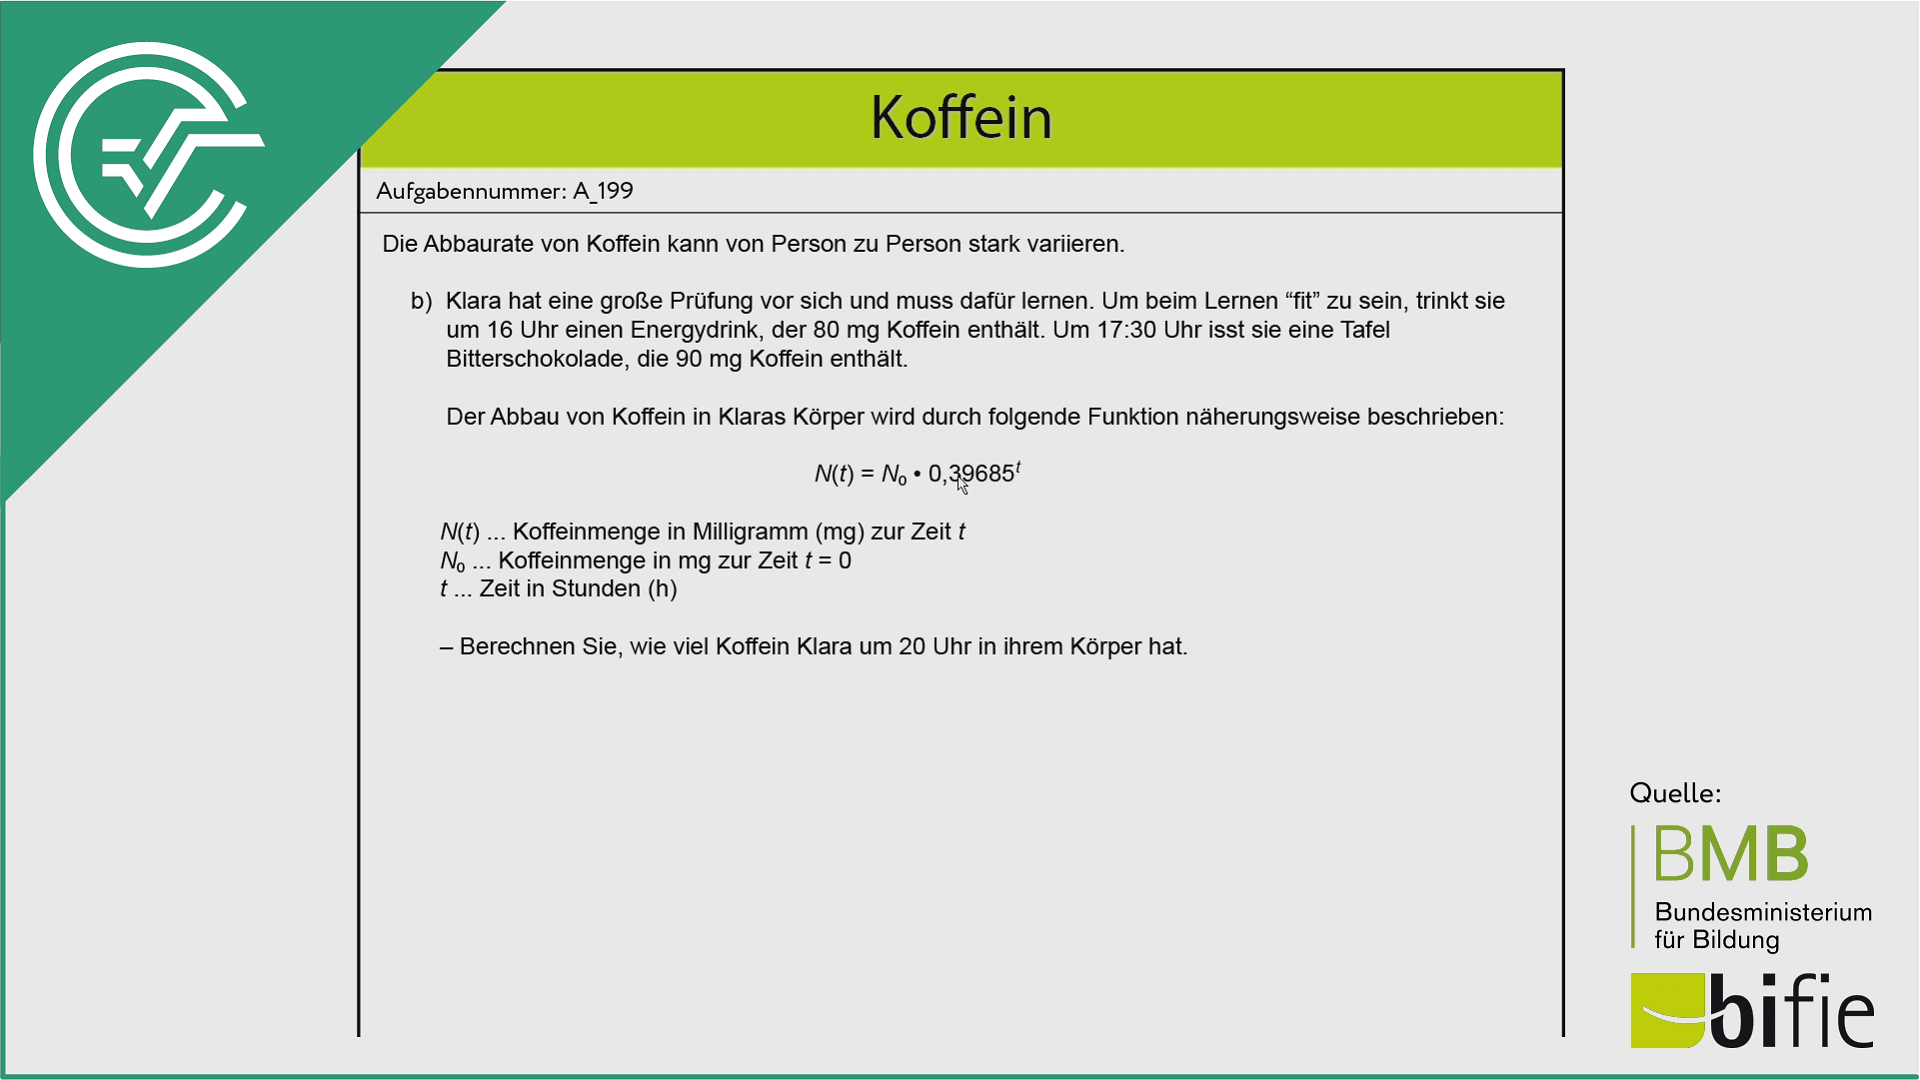 A_199 Koffein b [Exponentialfunktion]